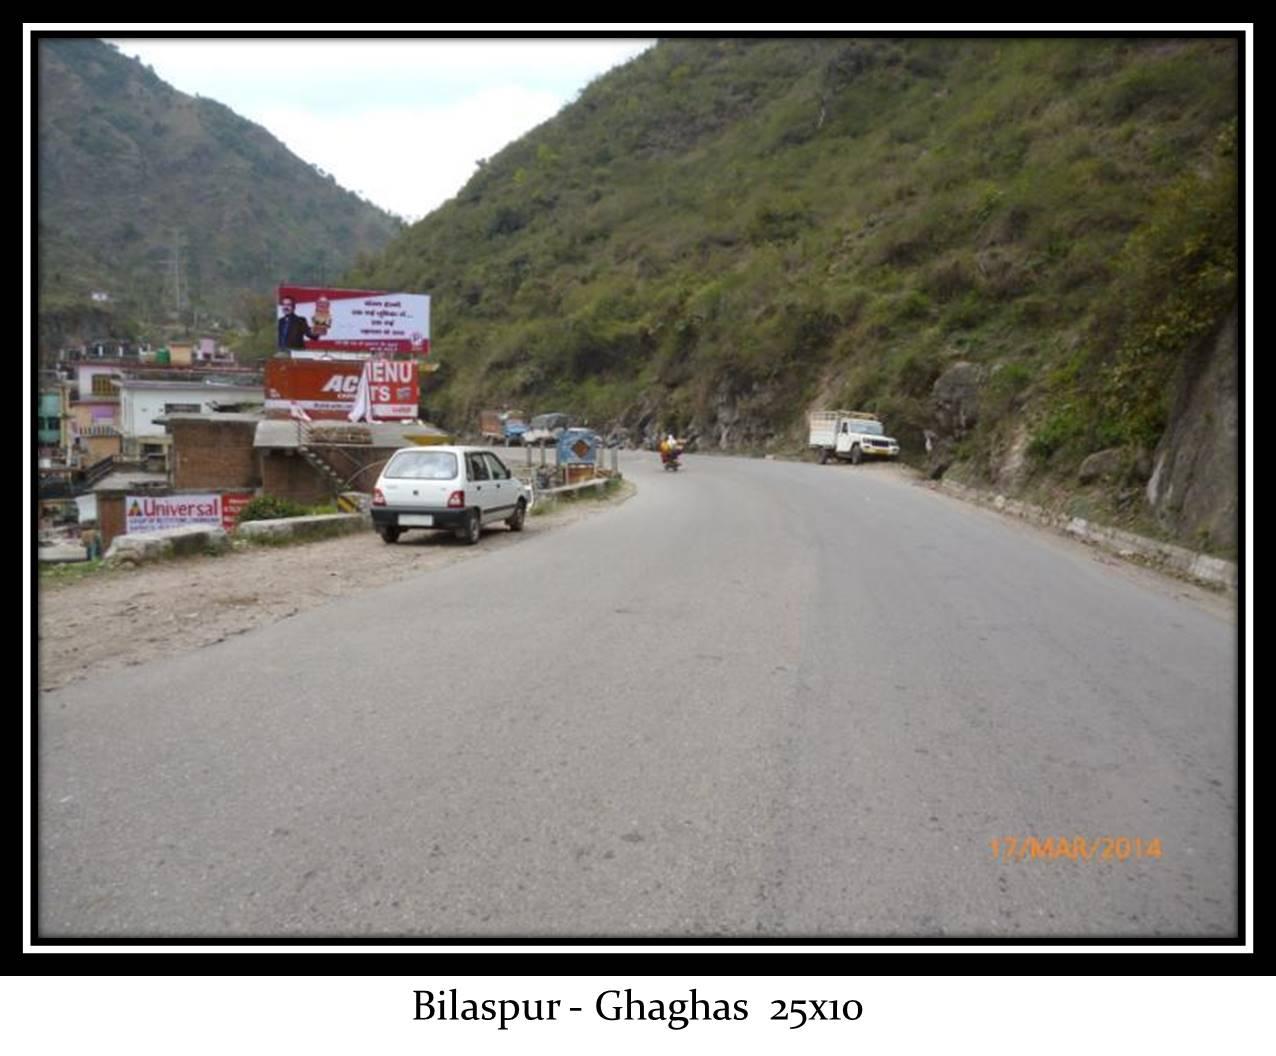 Ghaghas, Bilaspur